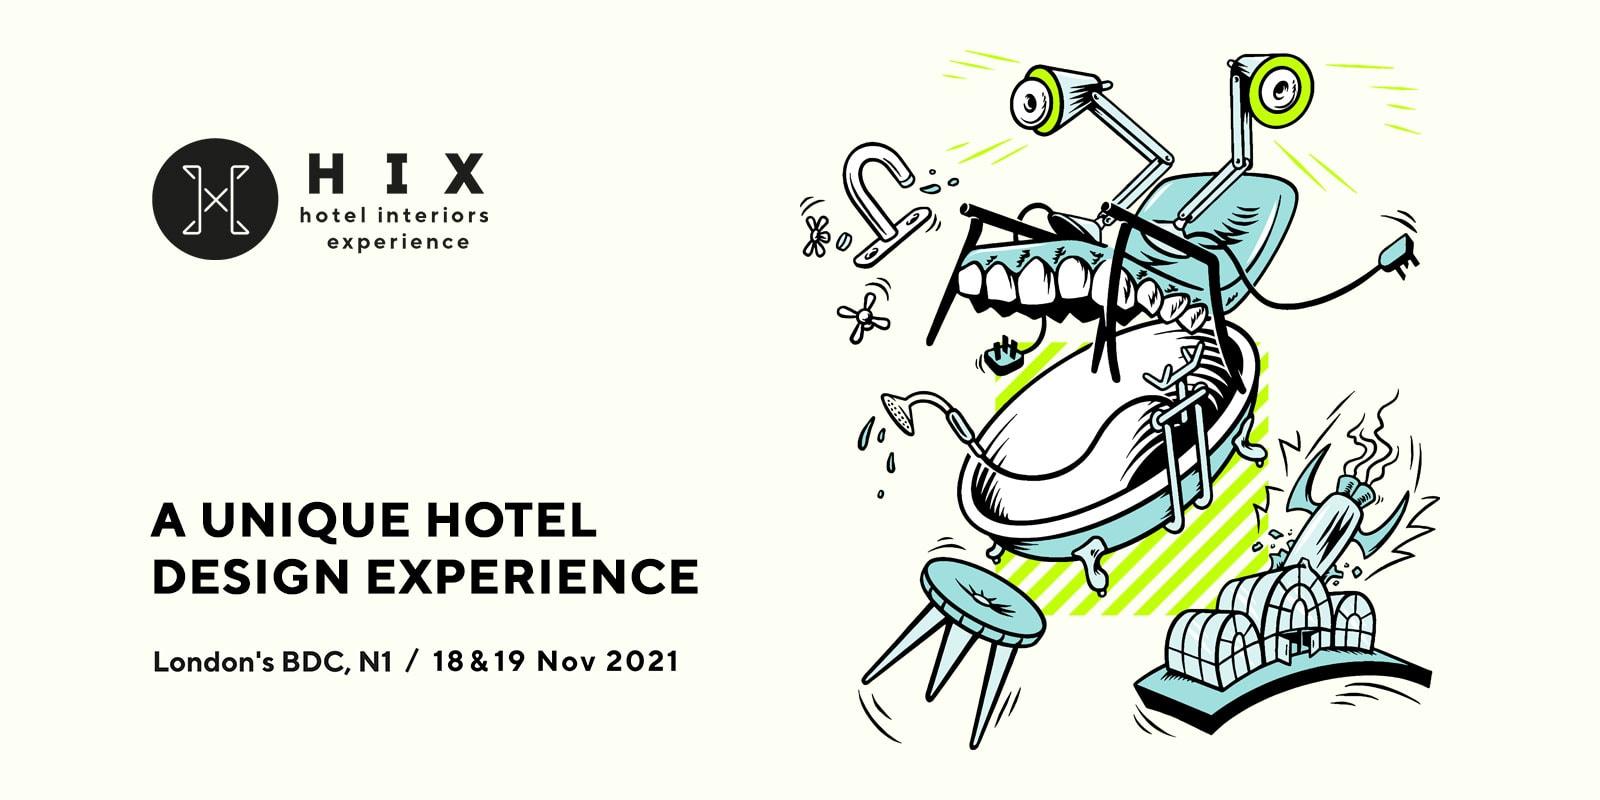 Hotel Interior Experience (HIX)